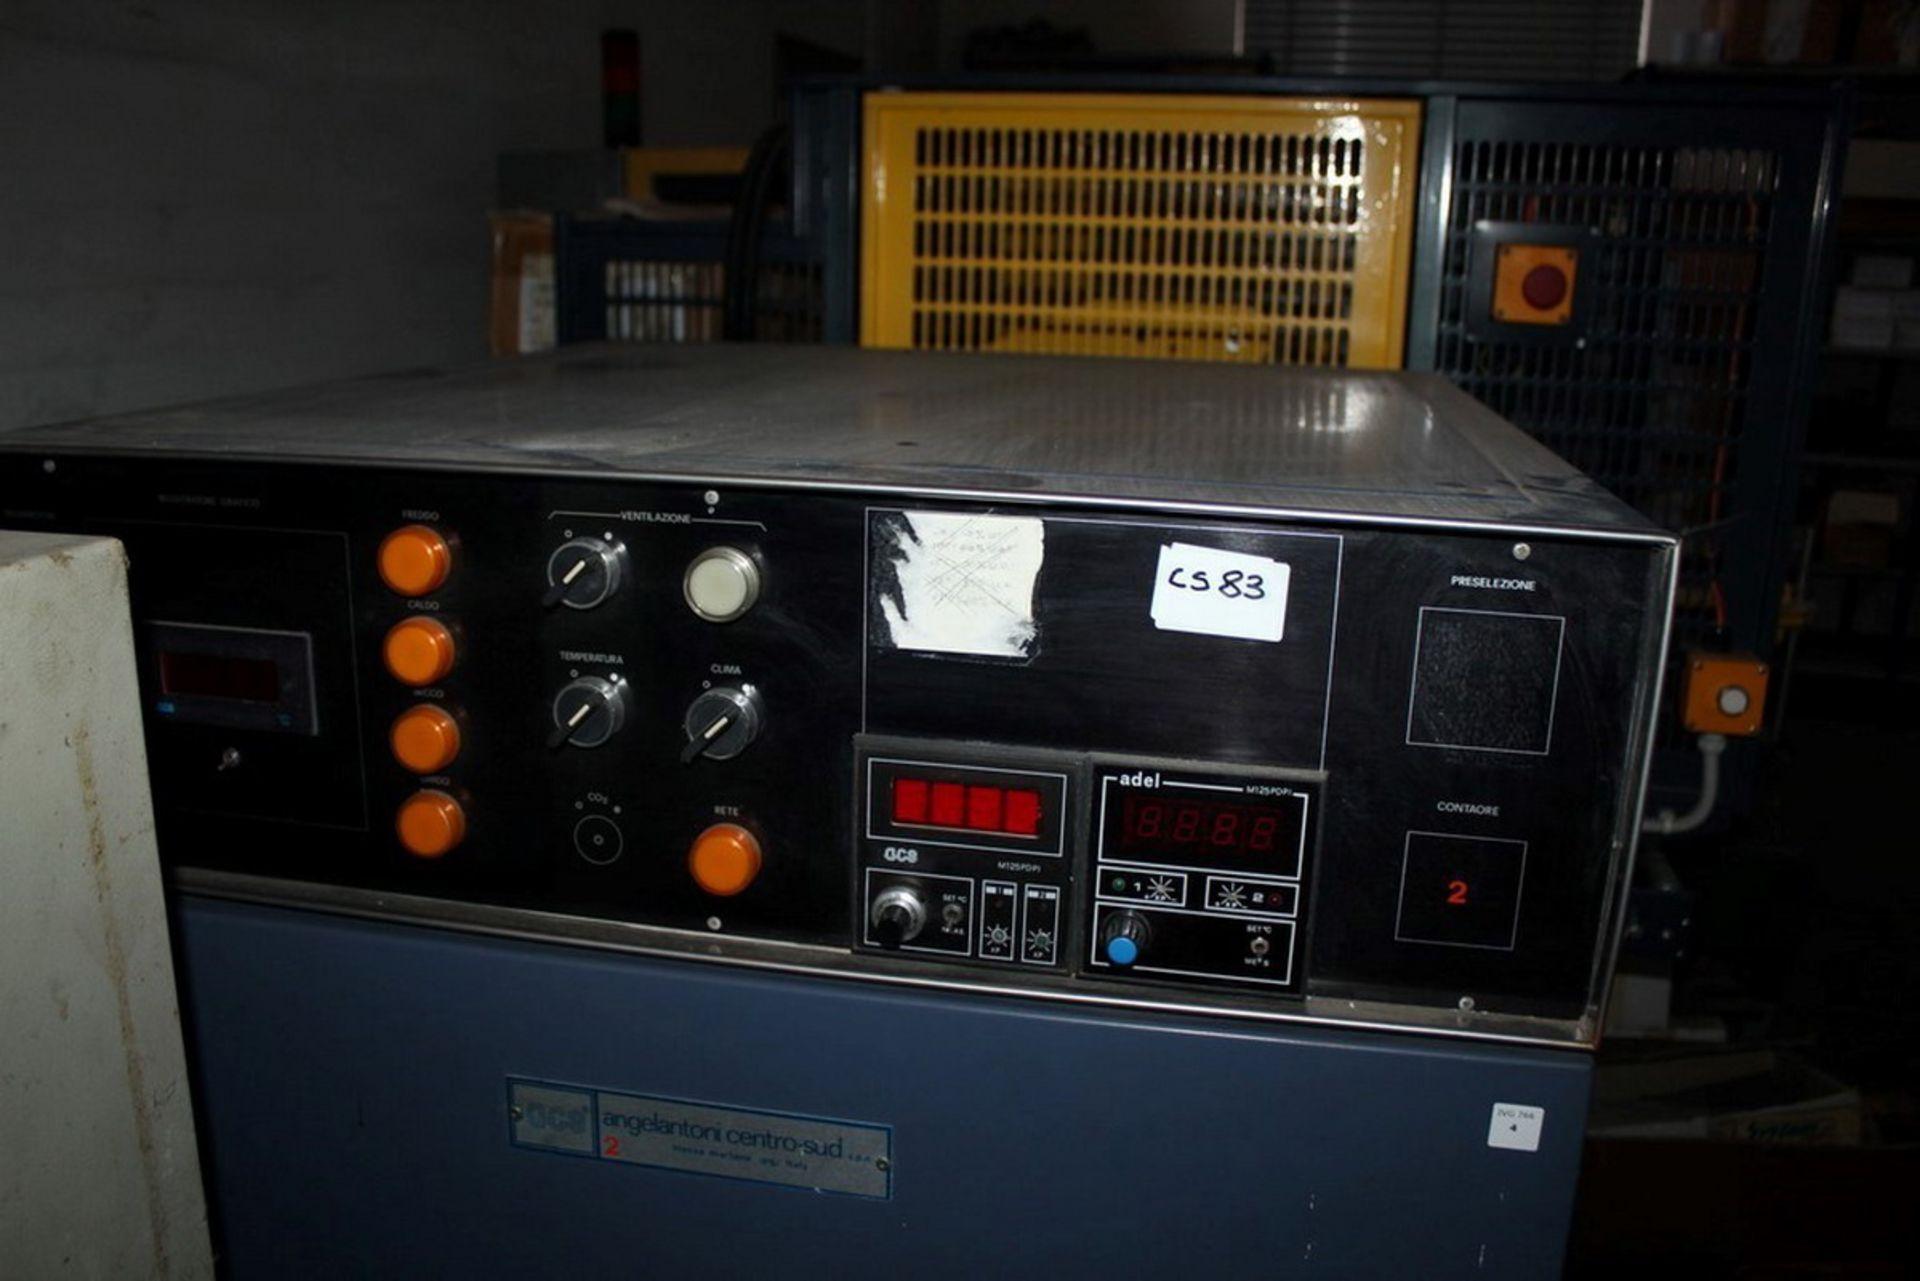 Lot 164 - N. 4 (766 IVG FALLIMENTO) ESSICCATORE FRIG. LPE 1000, TIPO UV 110, ANNO 1982 (N.CS 83 - N. CESPITE